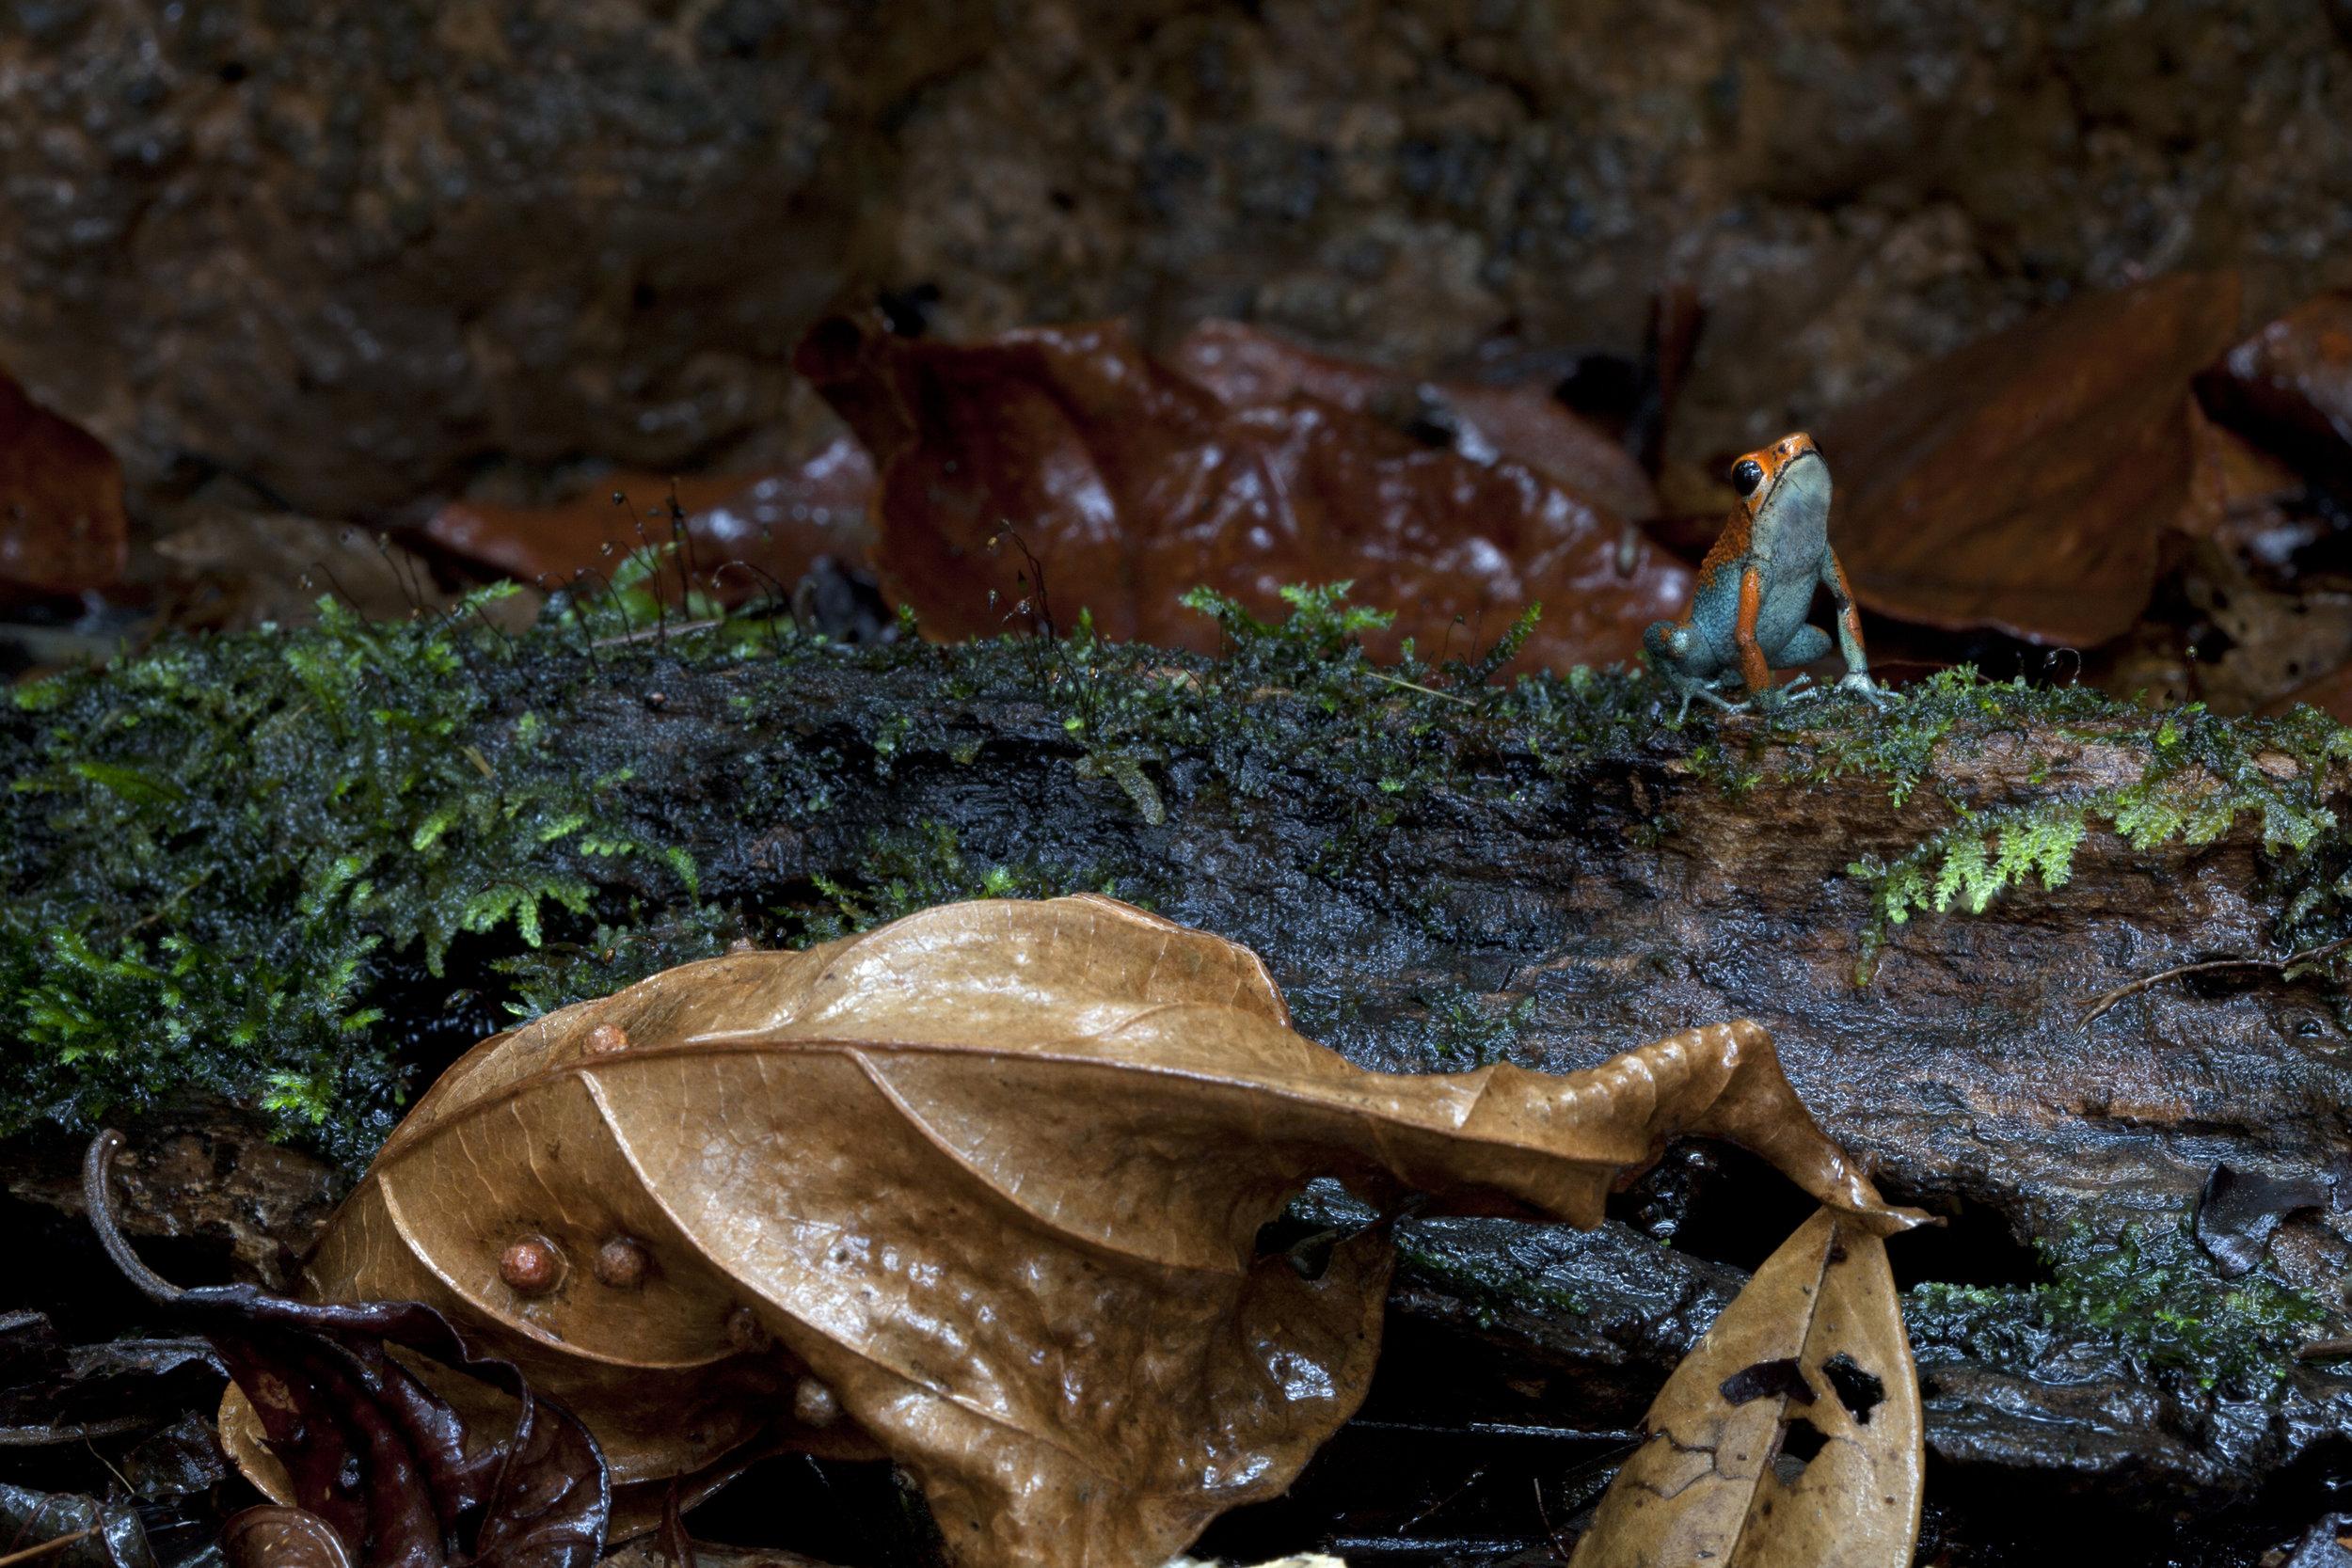 Poison Dart Frog, Costa Rican Amphibian Research Center, Costa Rica